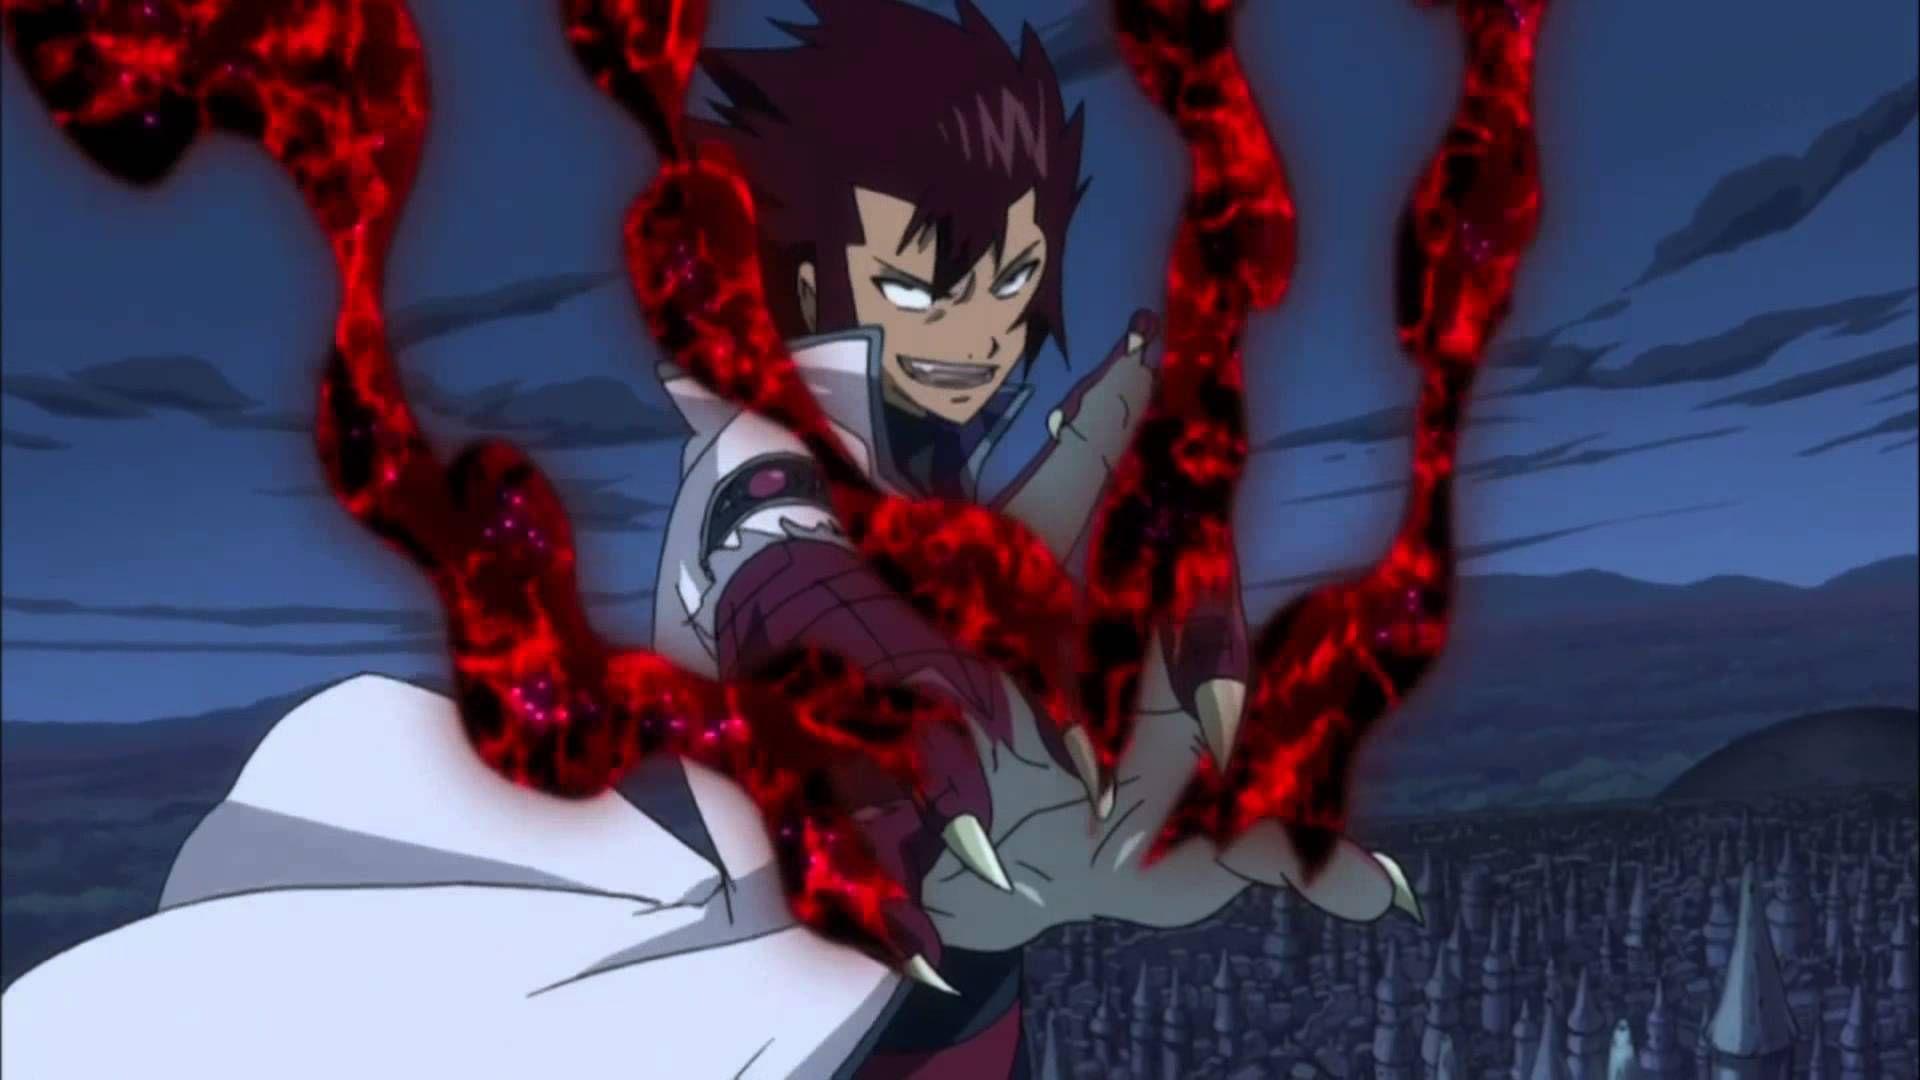 Cobra Erik Vs Battles Wiki Fandom Fairy Tail Cobra Fairy Tail Anime Fairy Tail